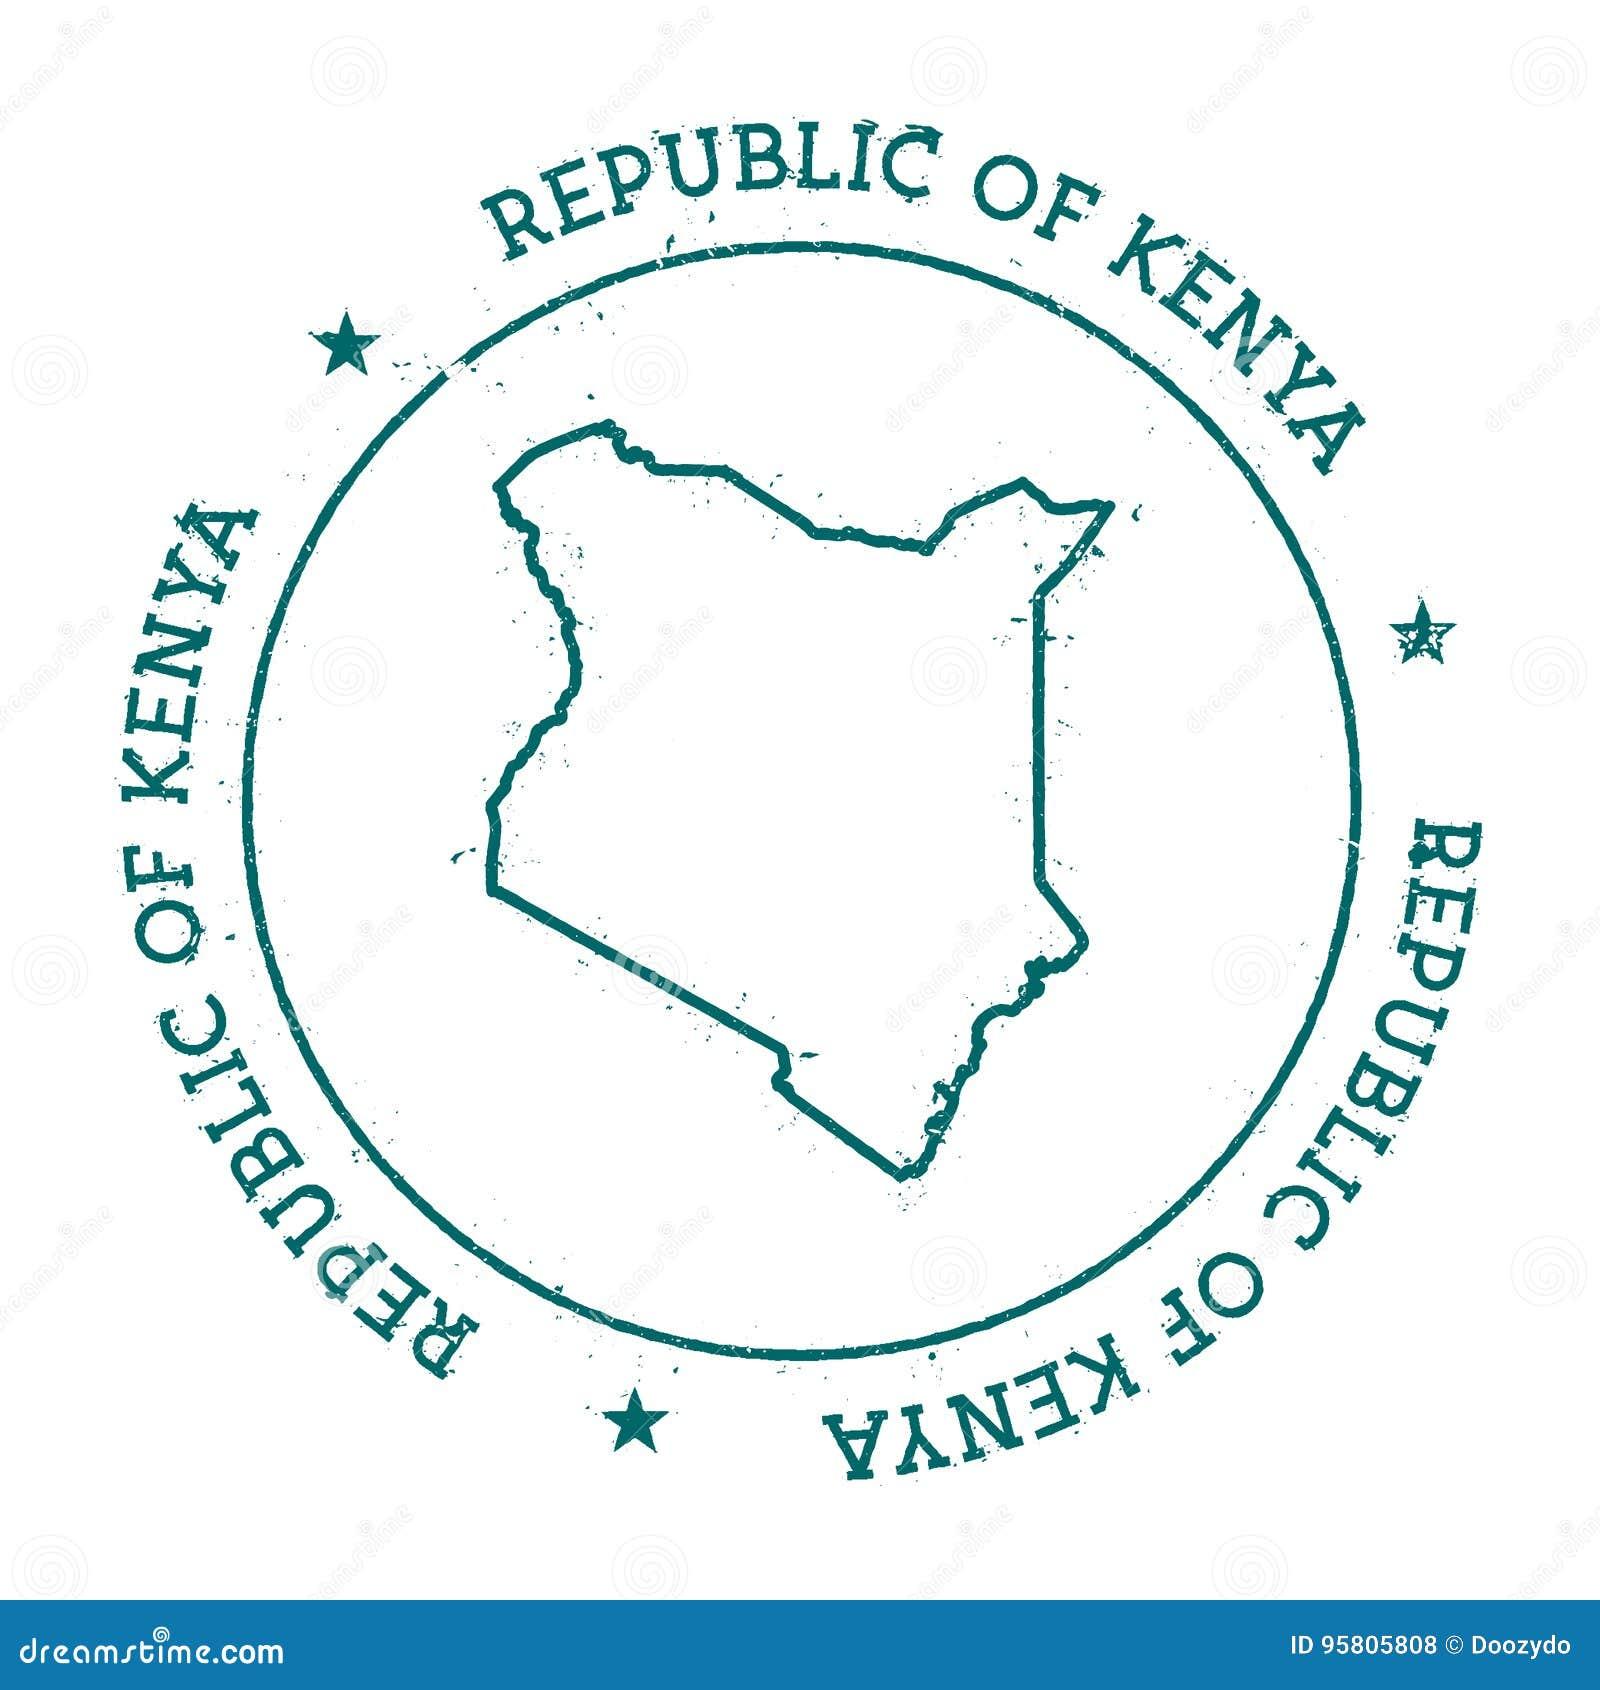 Kenya Map Over Usa on map of usa with states and cities, satellite over usa, flag over usa, map of sw usa, marijuana legalization map usa, plane over usa,